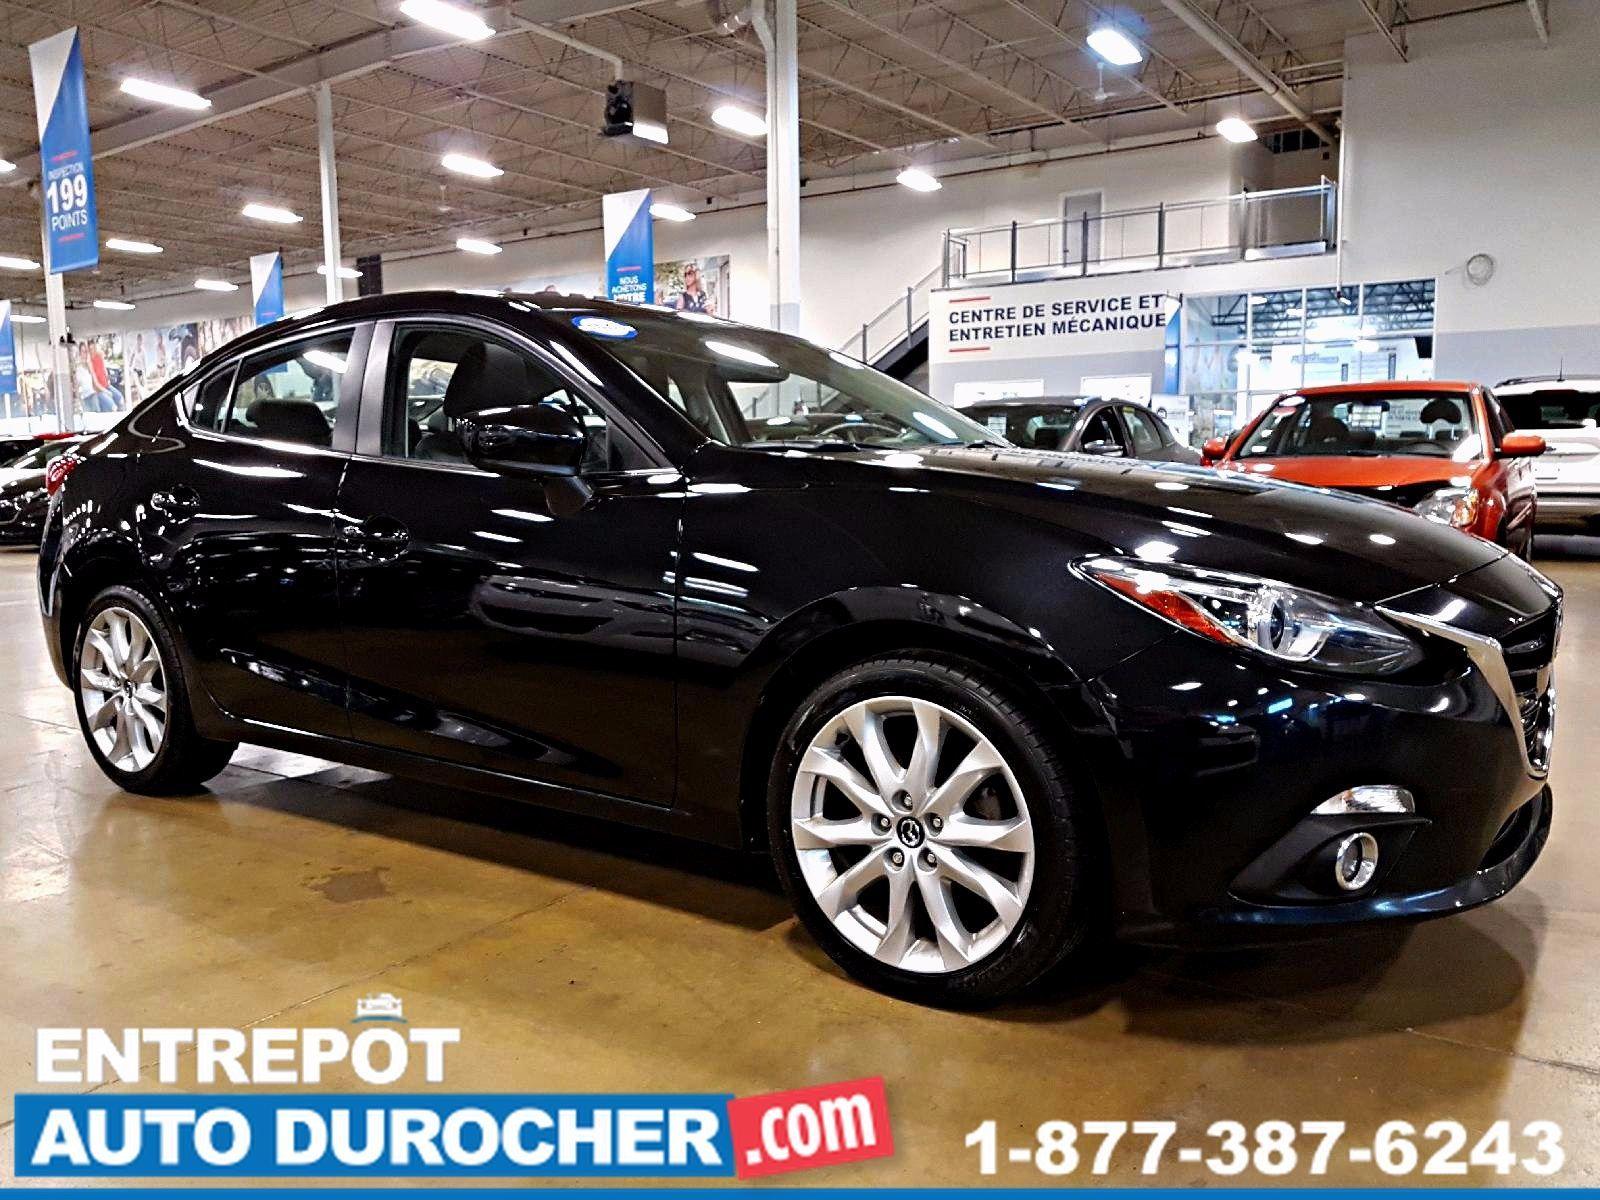 2015 Mazda Mazda3 GT - AUTOMATIQUE- TOIT OUVRANT - CUIR - NAVIGATION